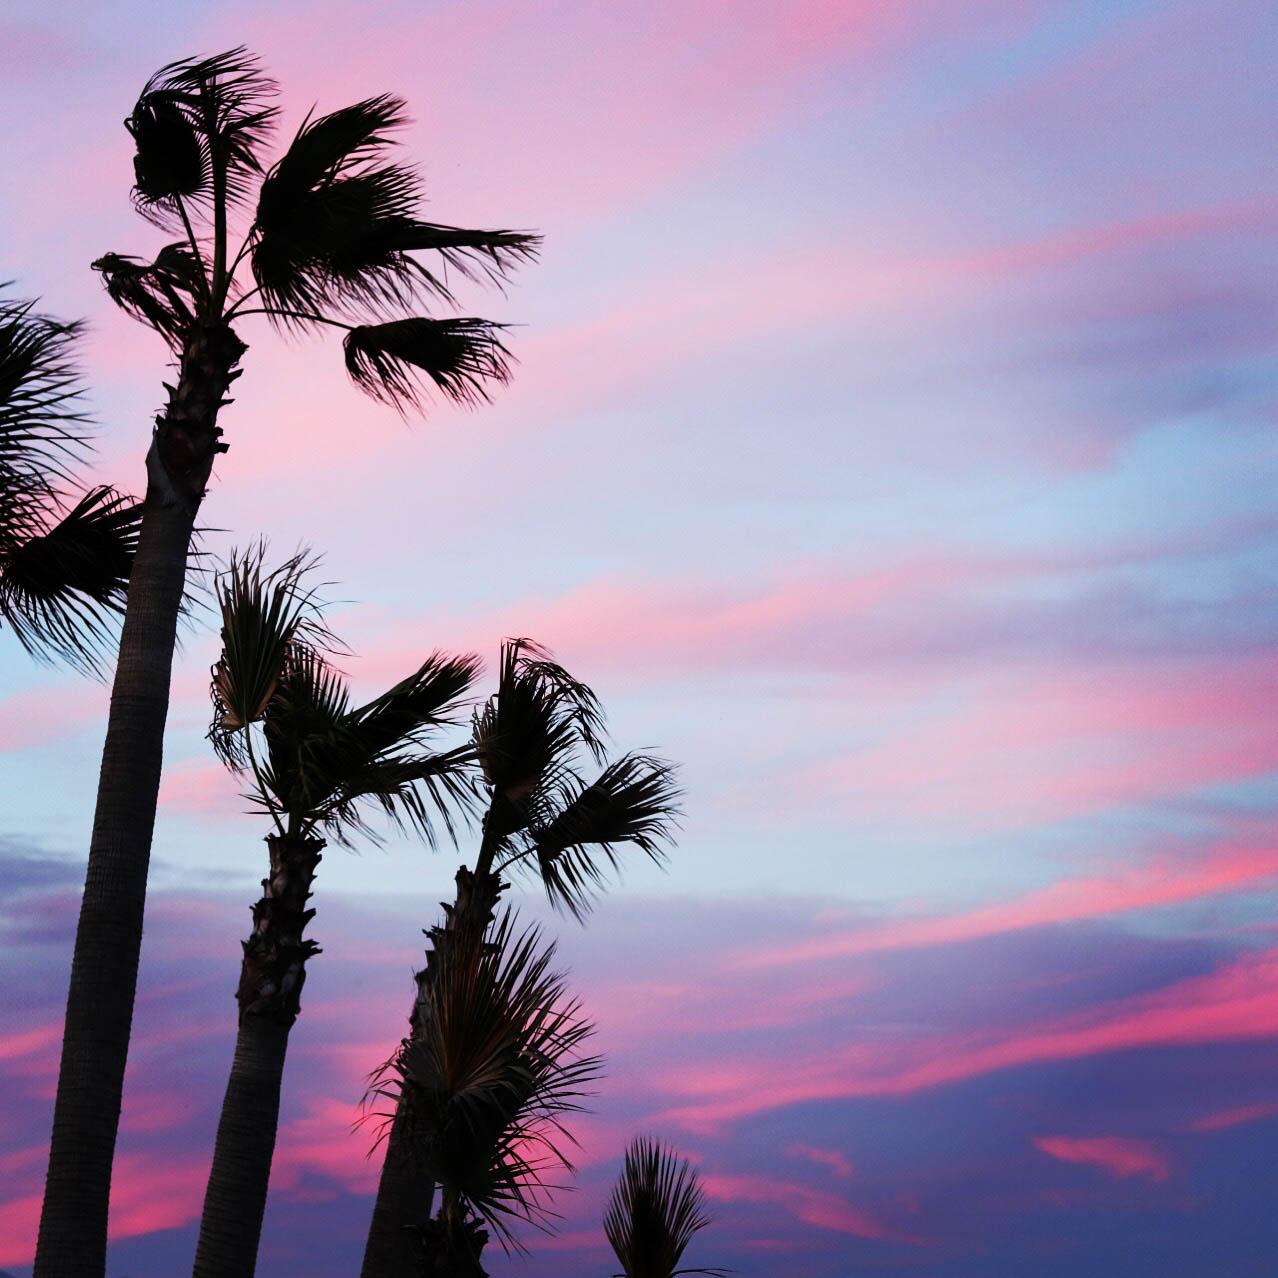 Sunset Spain Palm Trees